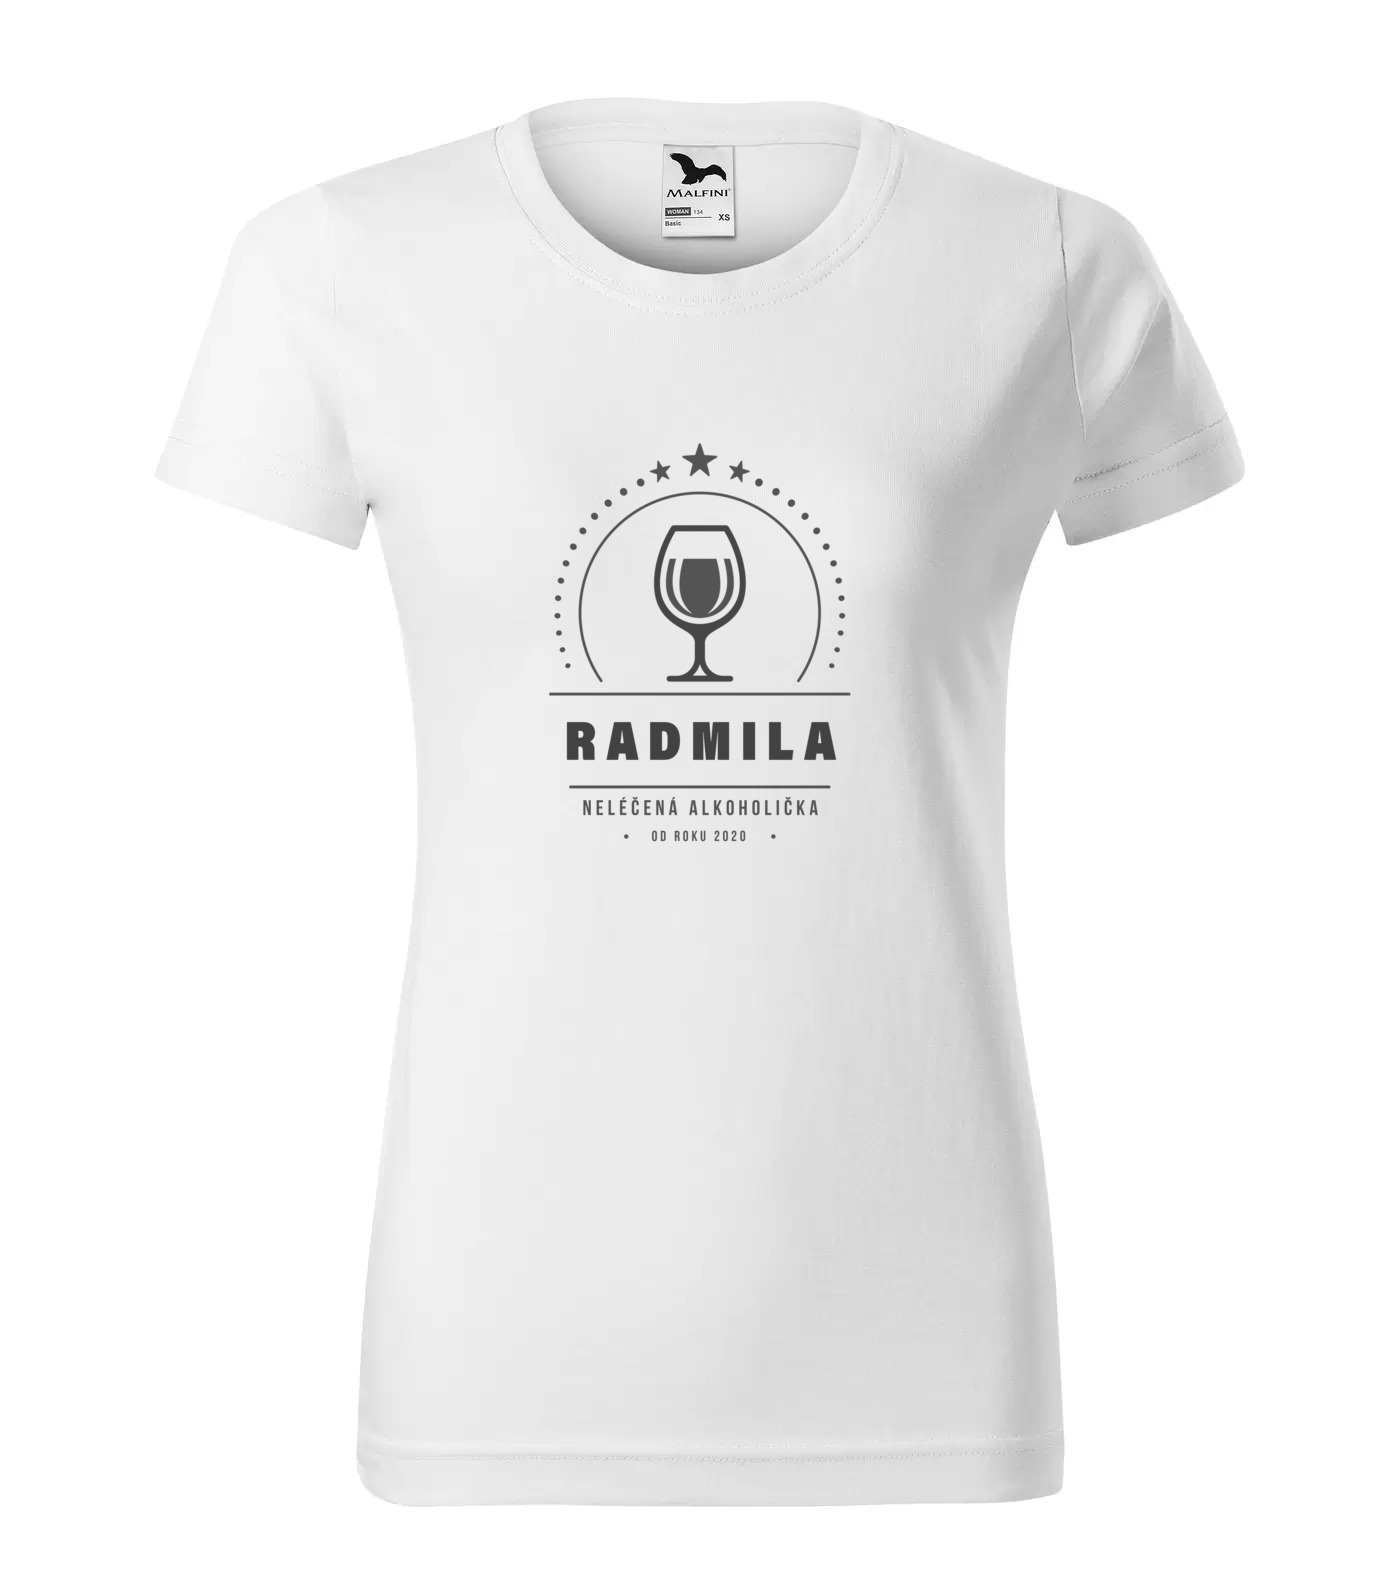 Tričko Alkoholička Radmila